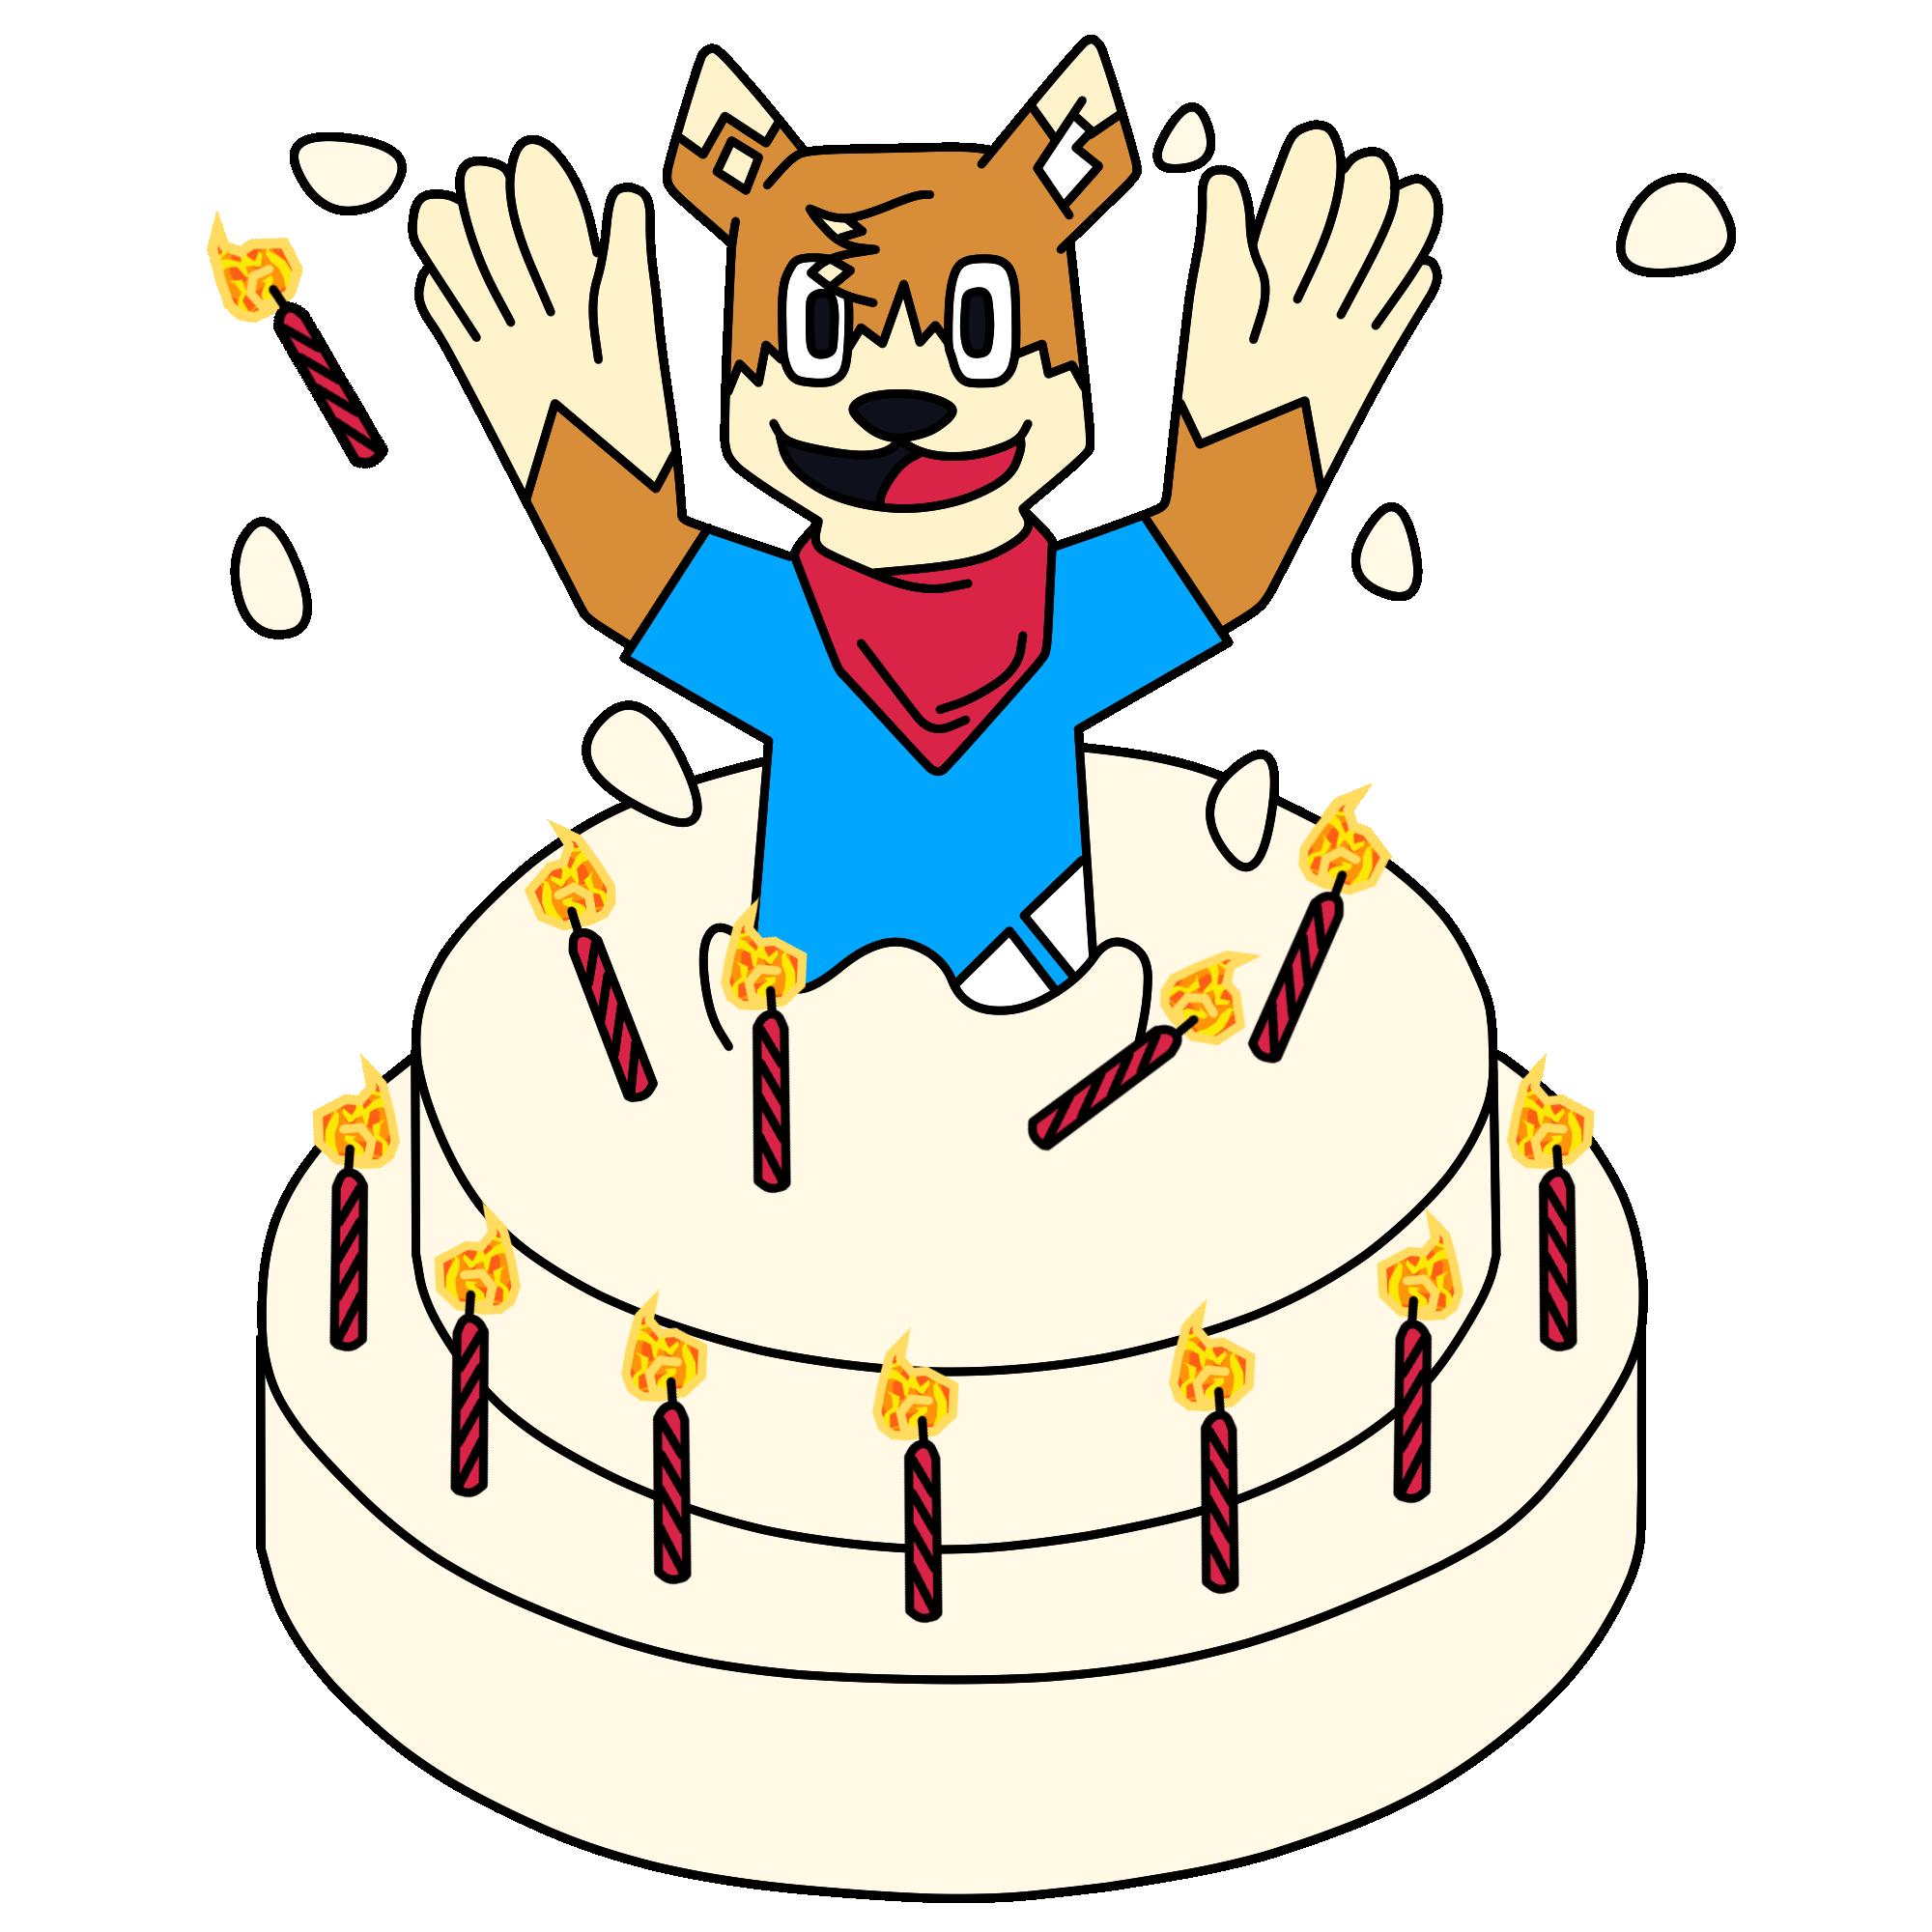 Happy Birthday by Draggaco